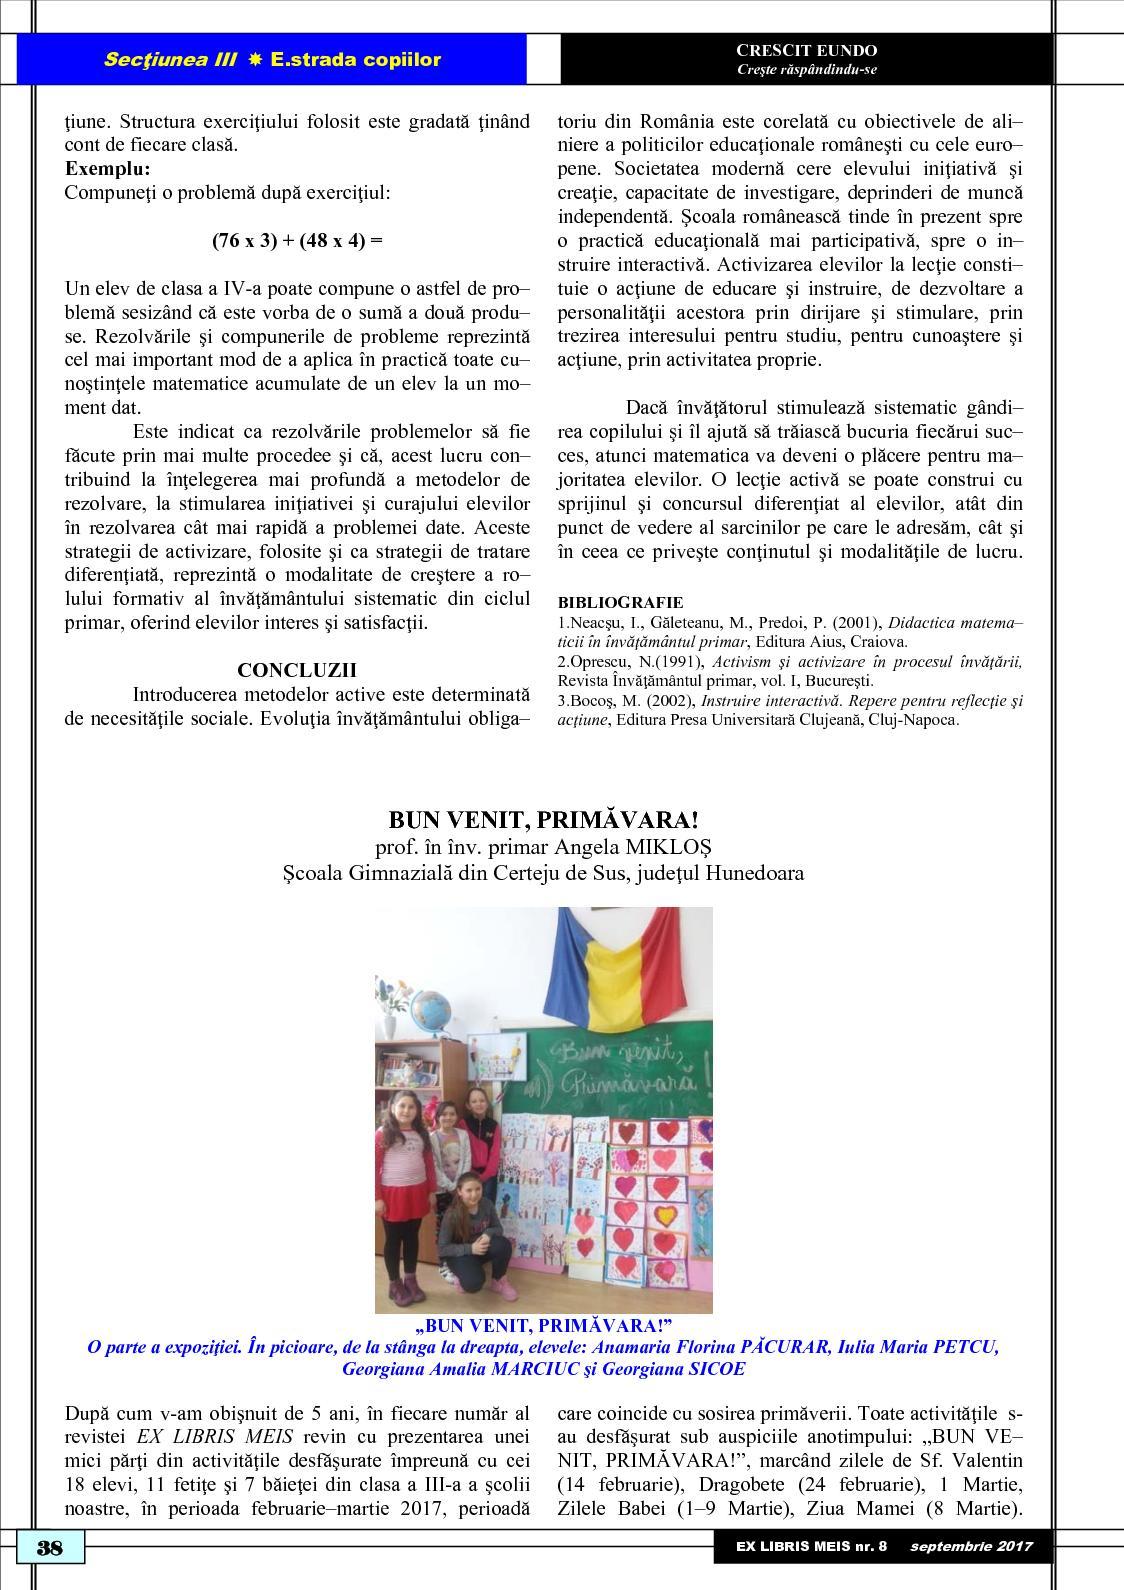 Intalnirea femeilor de la Togoleza)